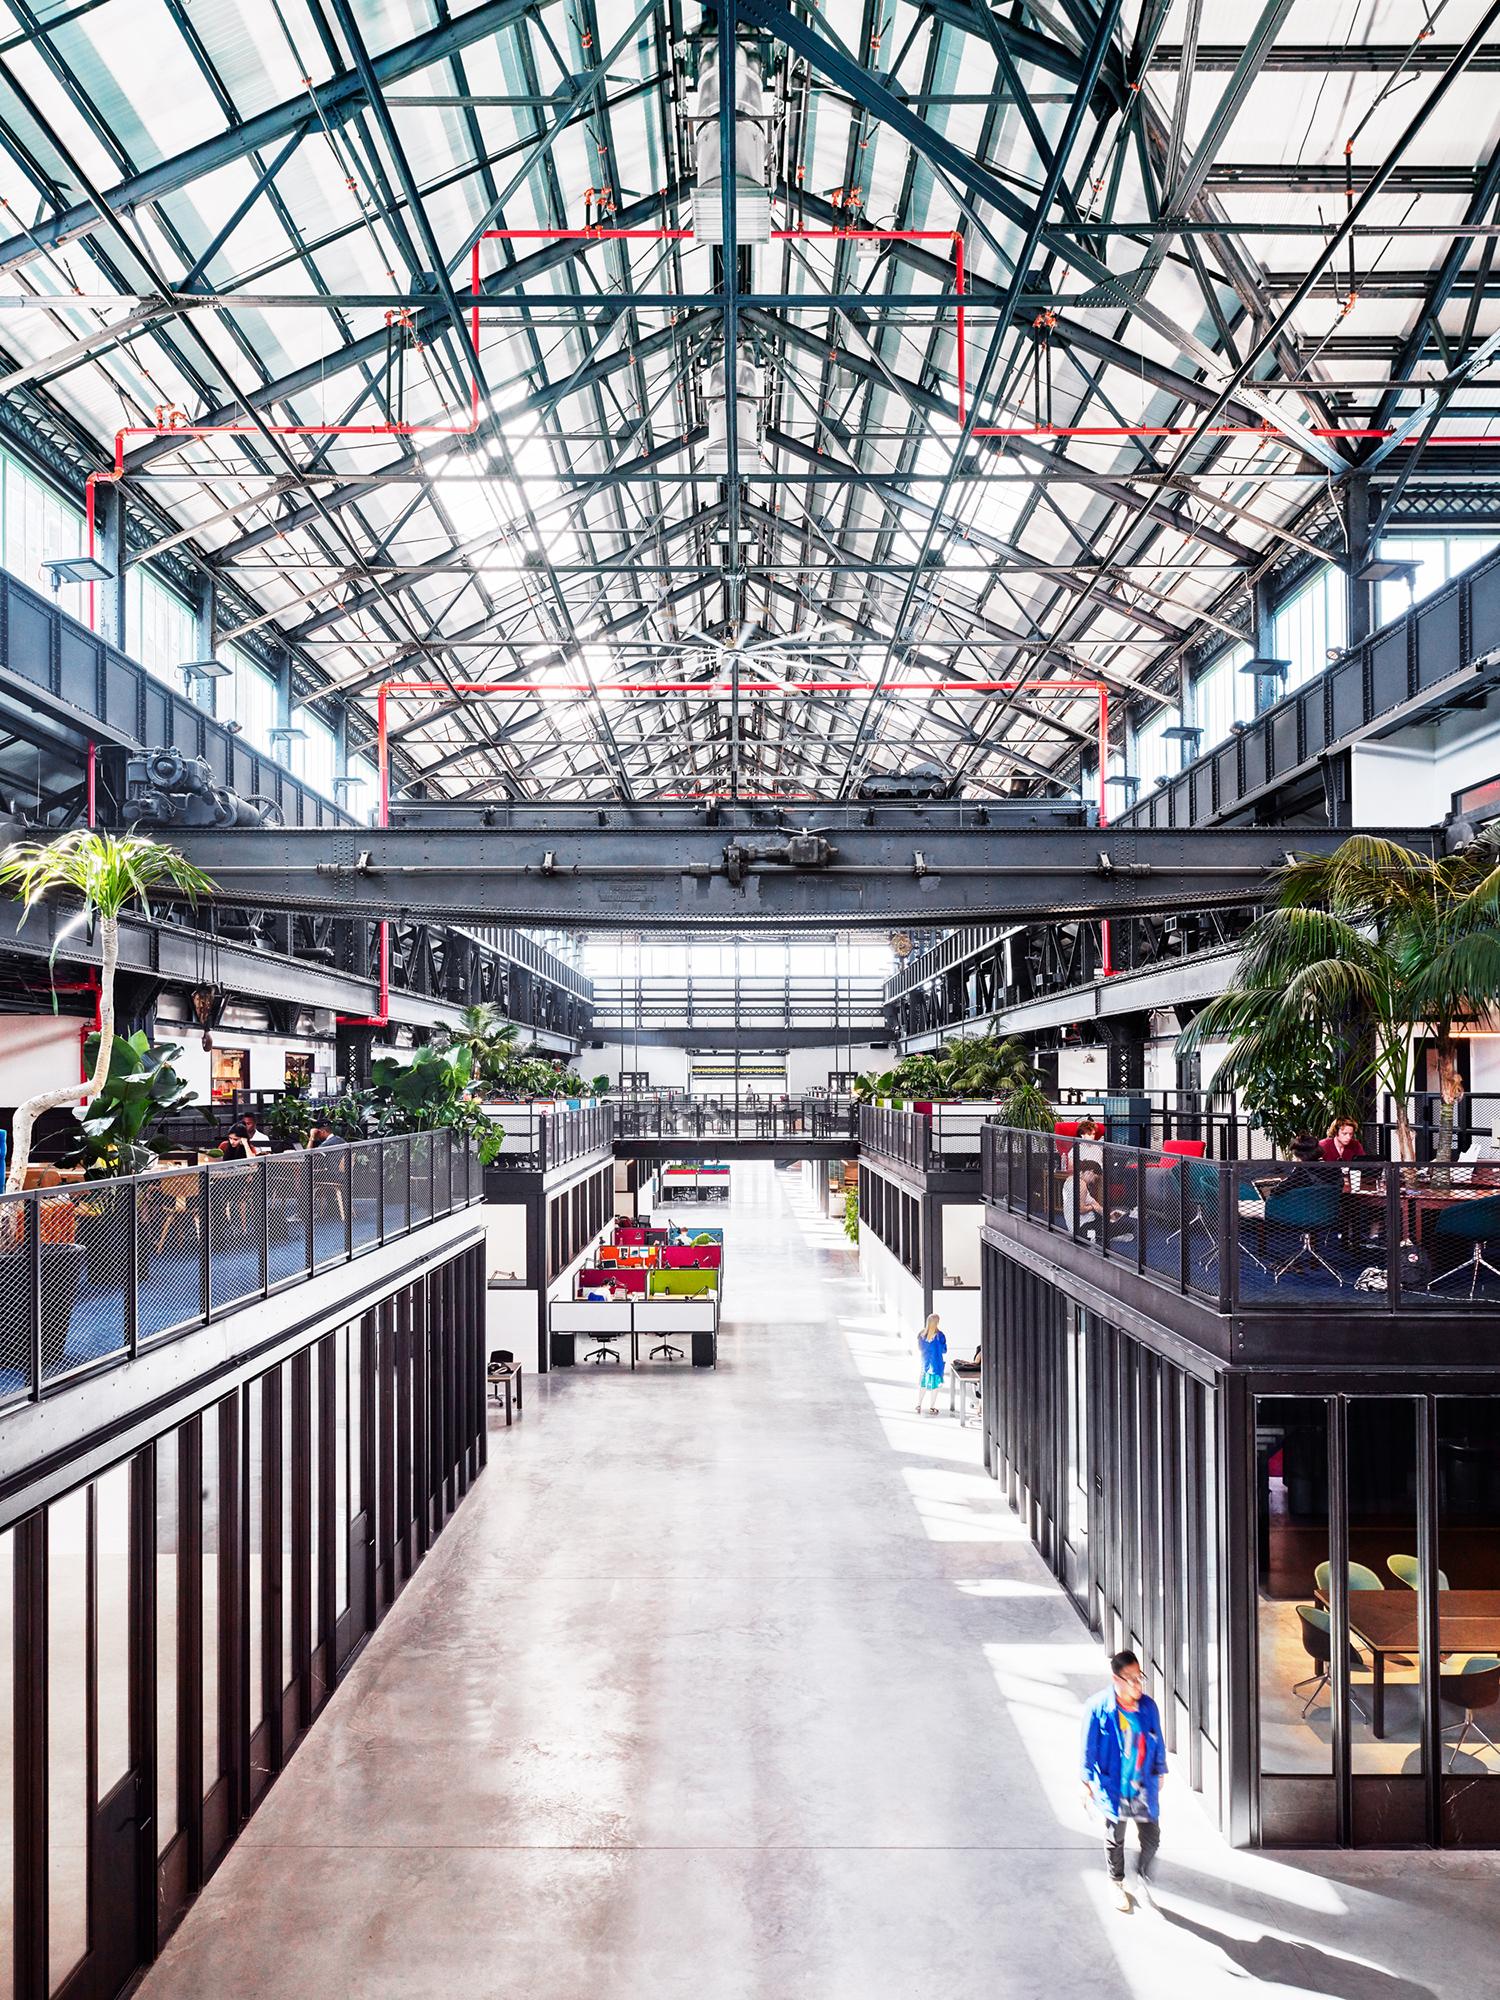 New Lab, Brooklyn, New York, 2016